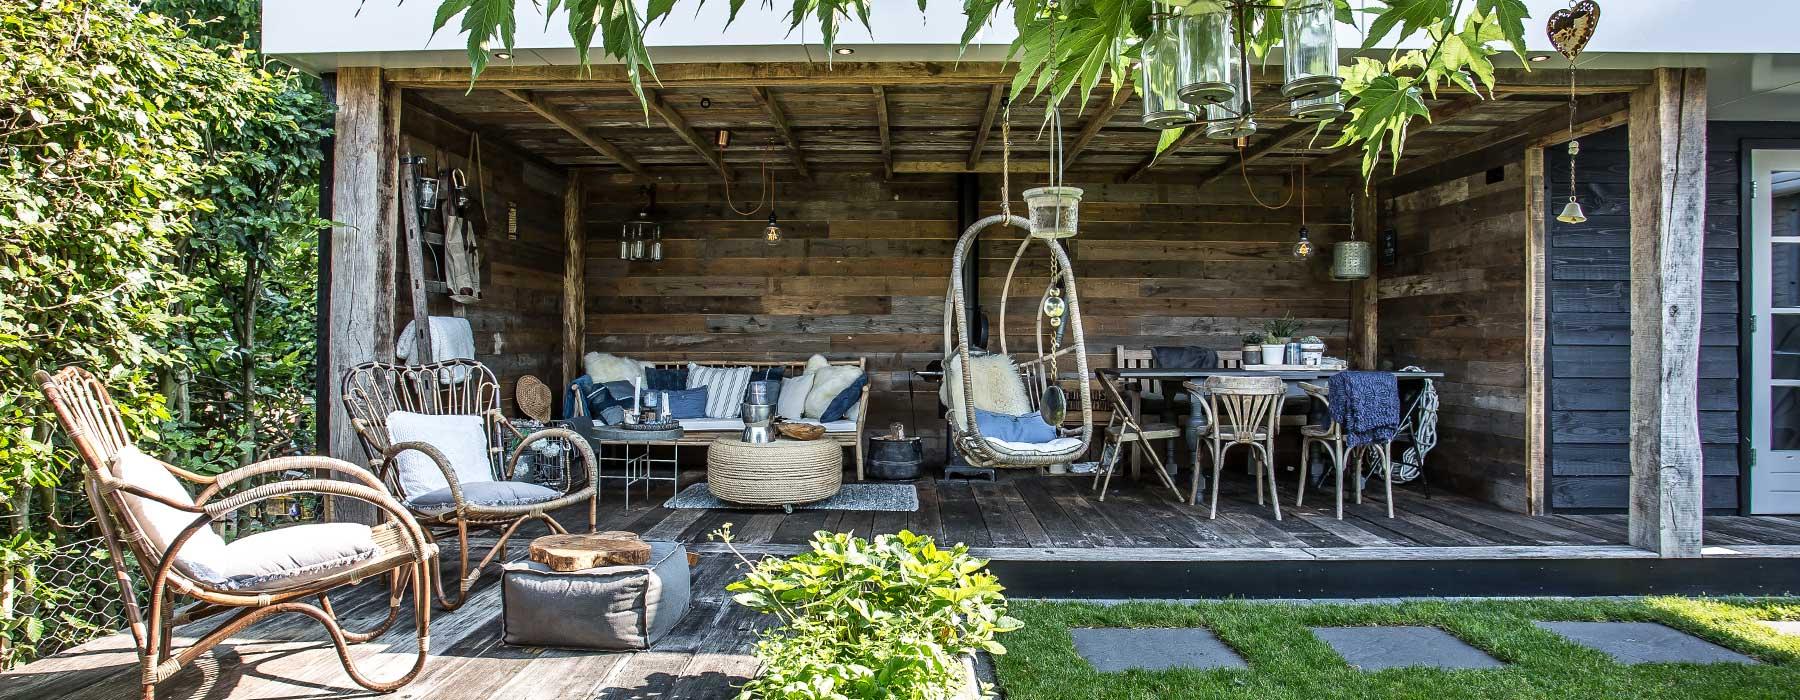 Mooi ingerichte veranda met hangstoel